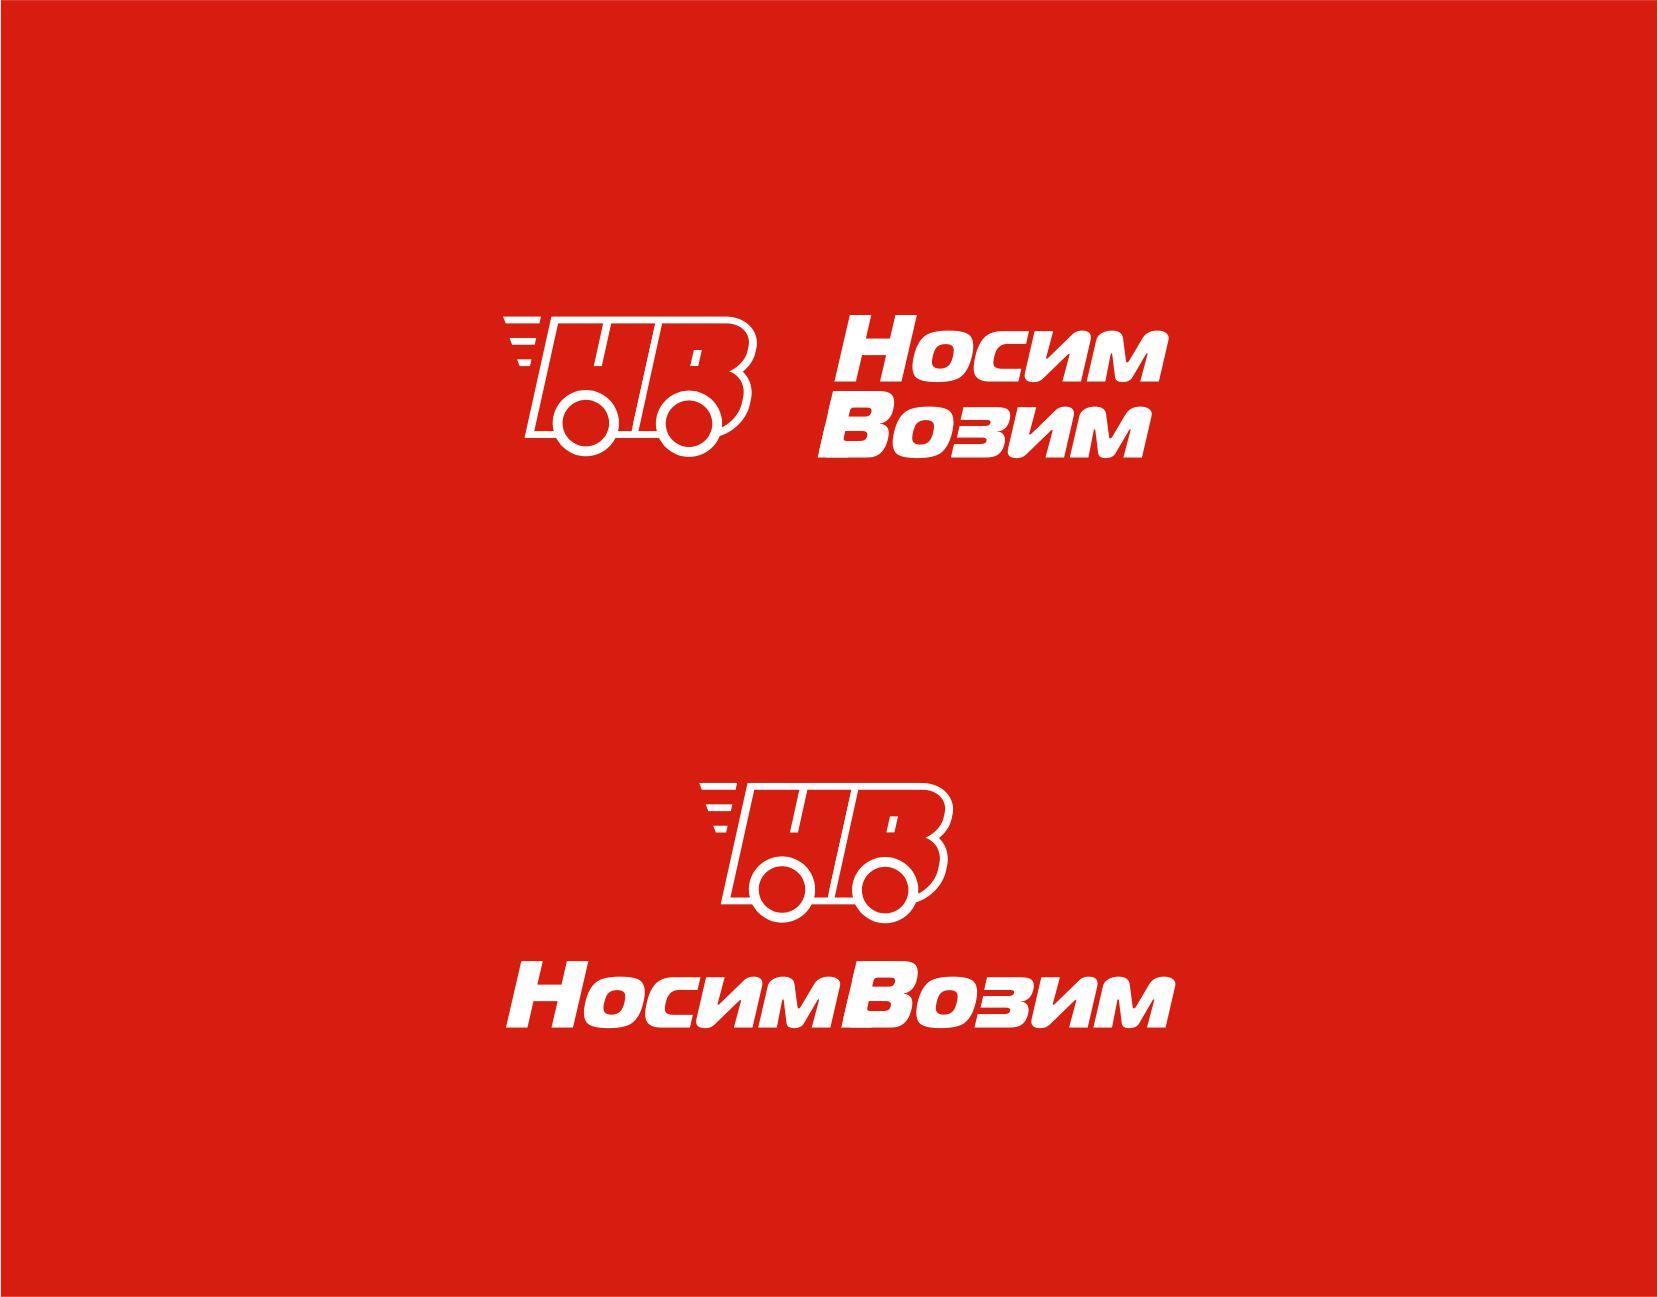 Логотип компании по перевозкам НосимВозим фото f_5575cf82569d8f64.jpg